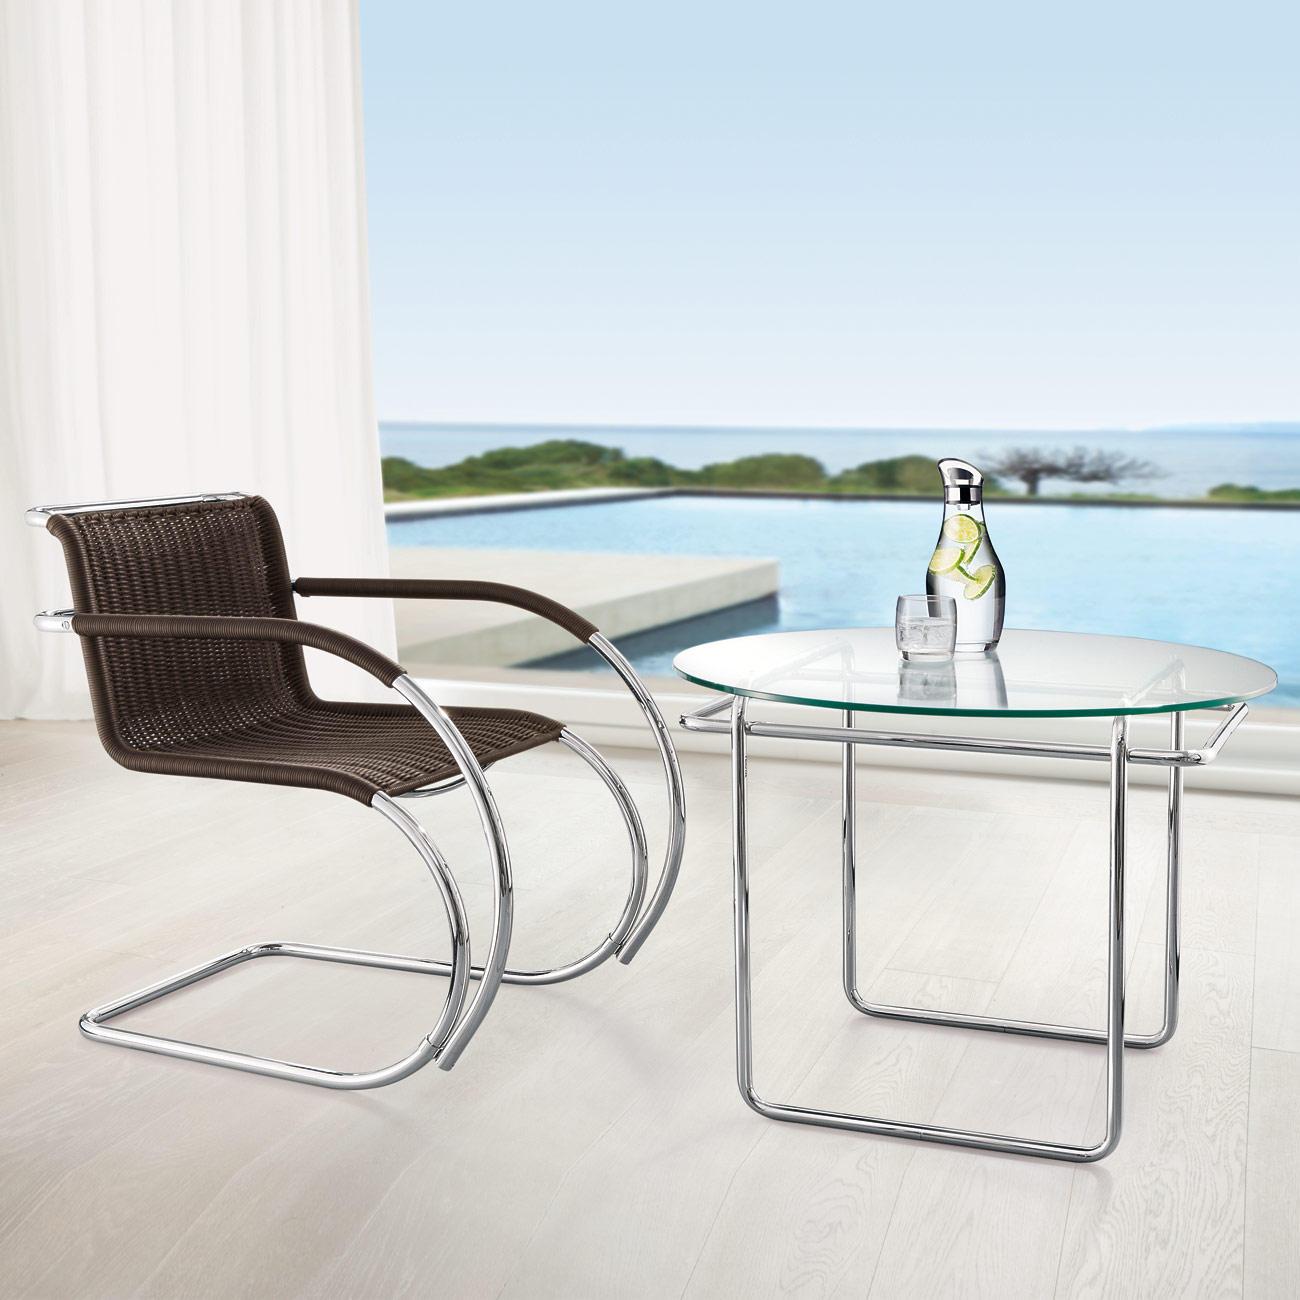 wei enhof sessel oder marcel breuer tisch online kaufen. Black Bedroom Furniture Sets. Home Design Ideas